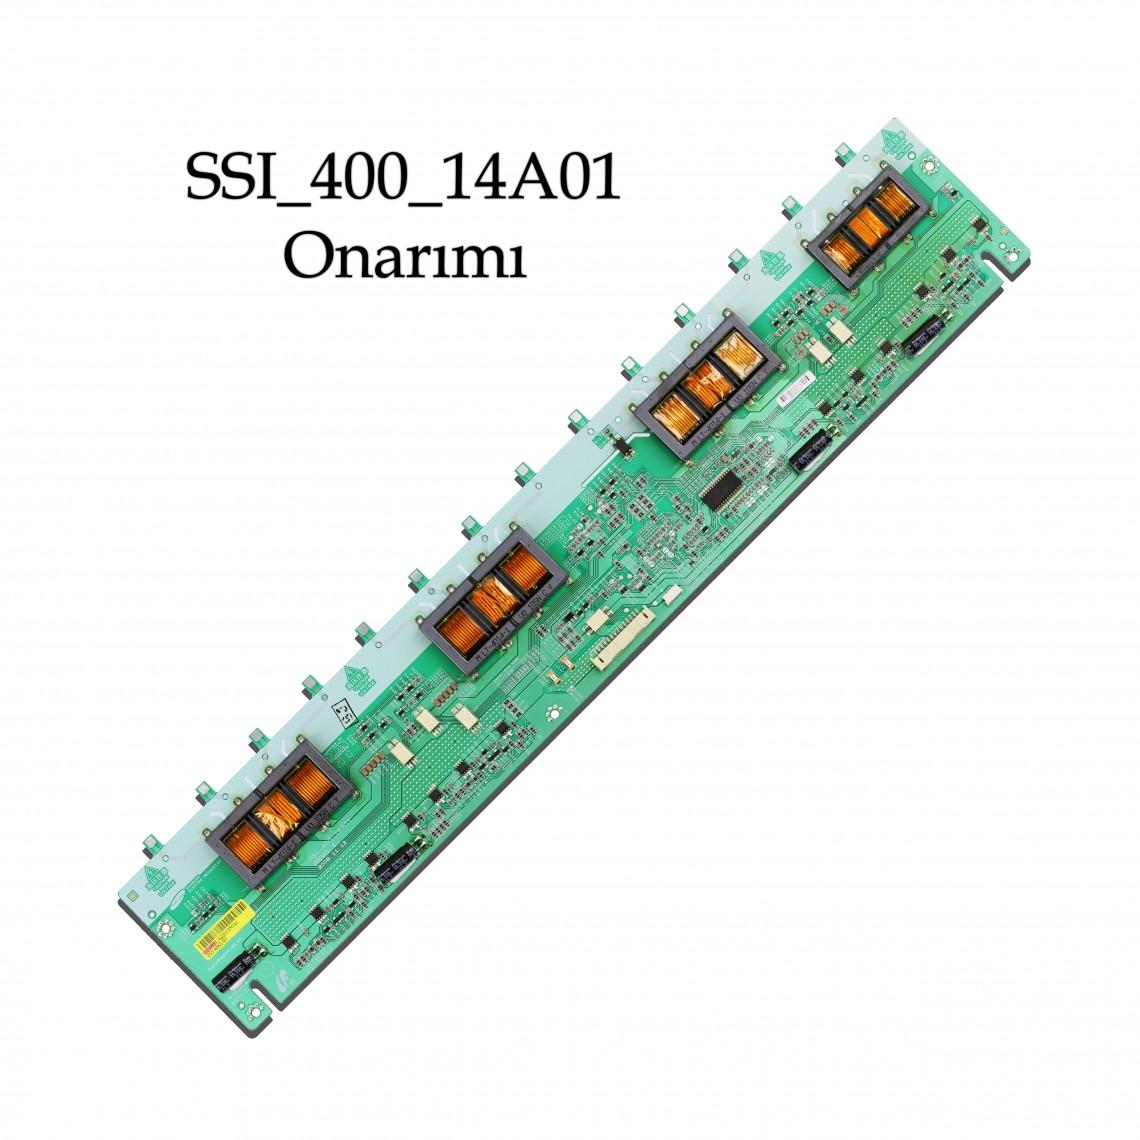 "SSI_400_14A01 REV0.1 , LTA400HA07, LTA400HA11, LTF400HA08, LTA400HF02,  VESTEL 40FP5003 40"" LCD, TOSHIBA 40RV525R, TOSHIBA 40RV52RZ, TOSHIBA 40XV645U, INVERTER BOARD, Onarım"